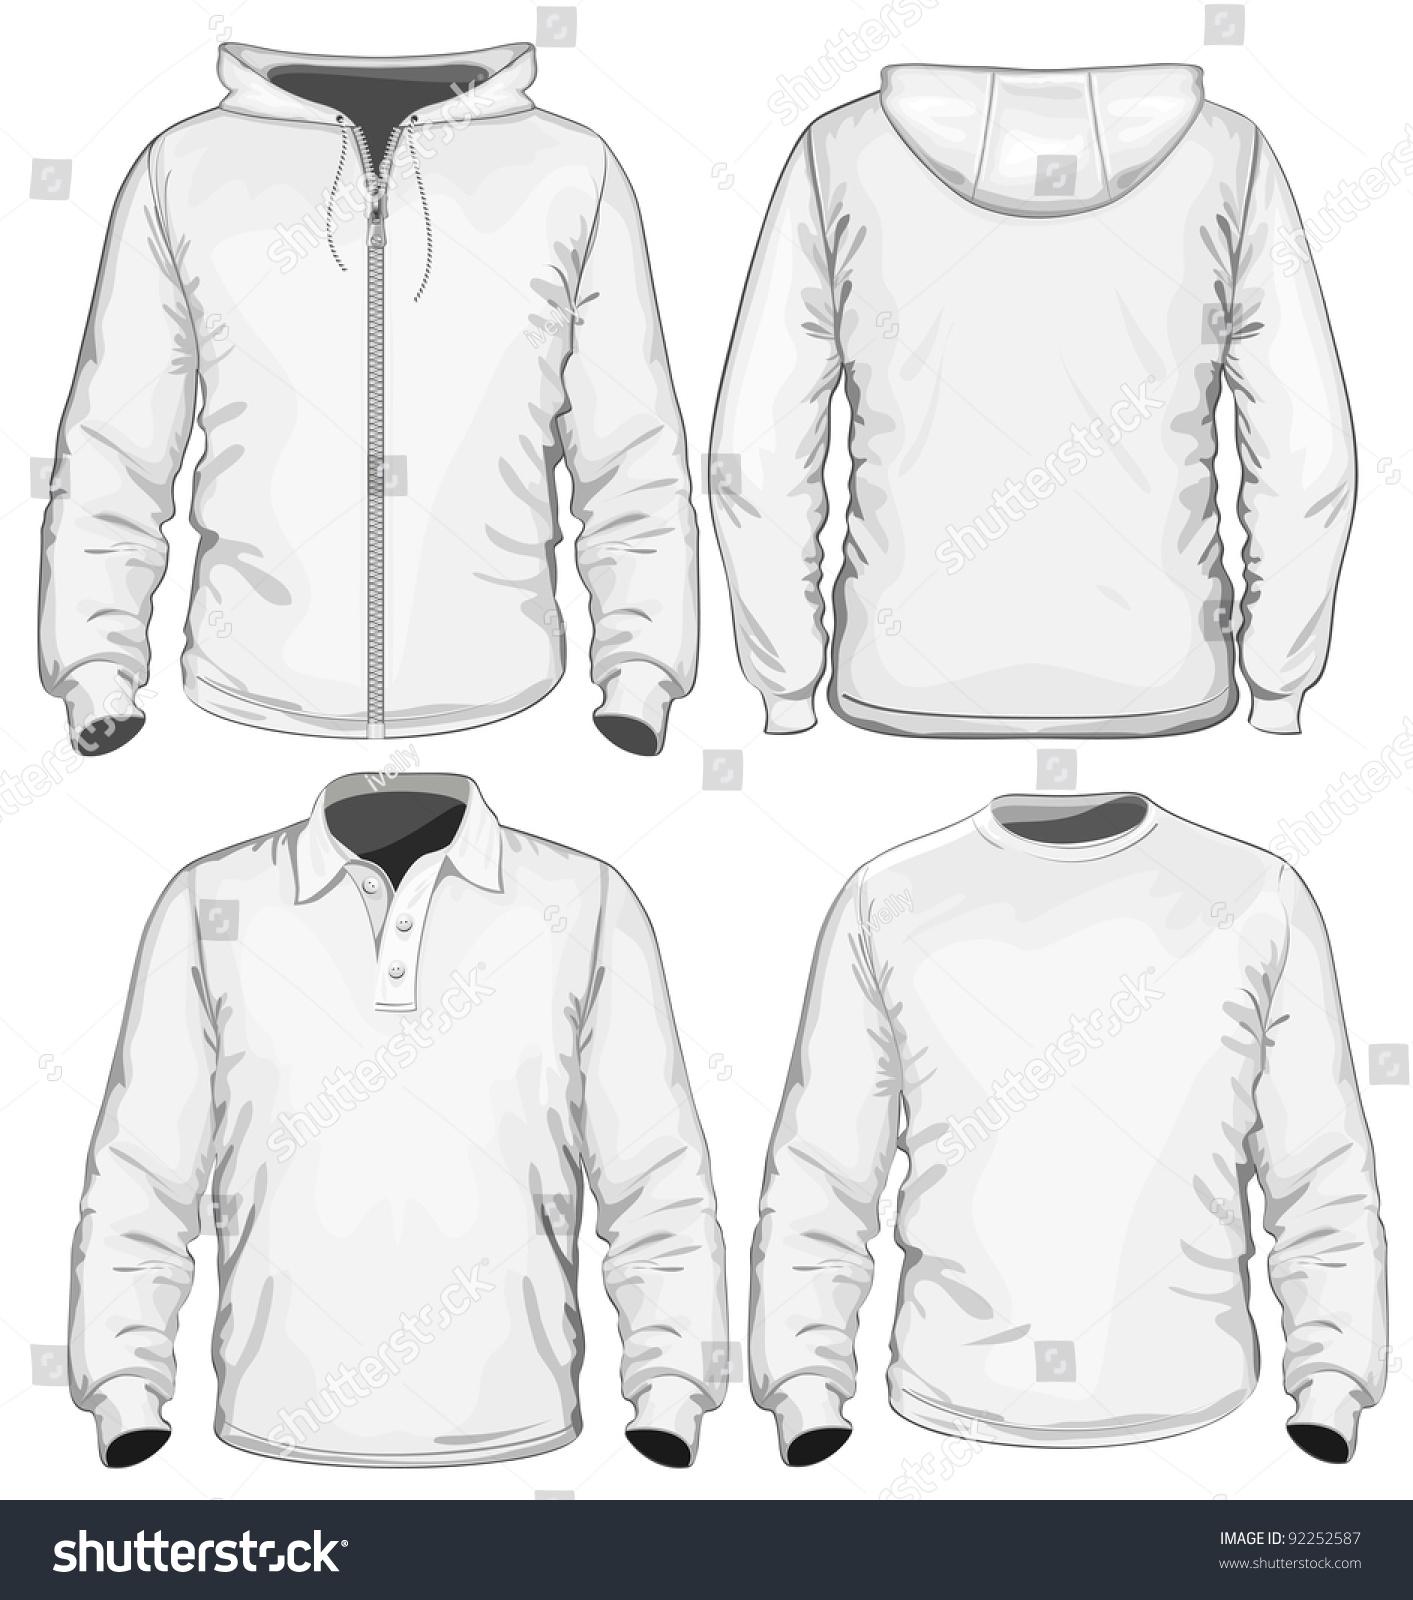 Shirt design vector pack - Amazing Vector Set Men S Polo Shirt T Shirt And Sweatshirt Long